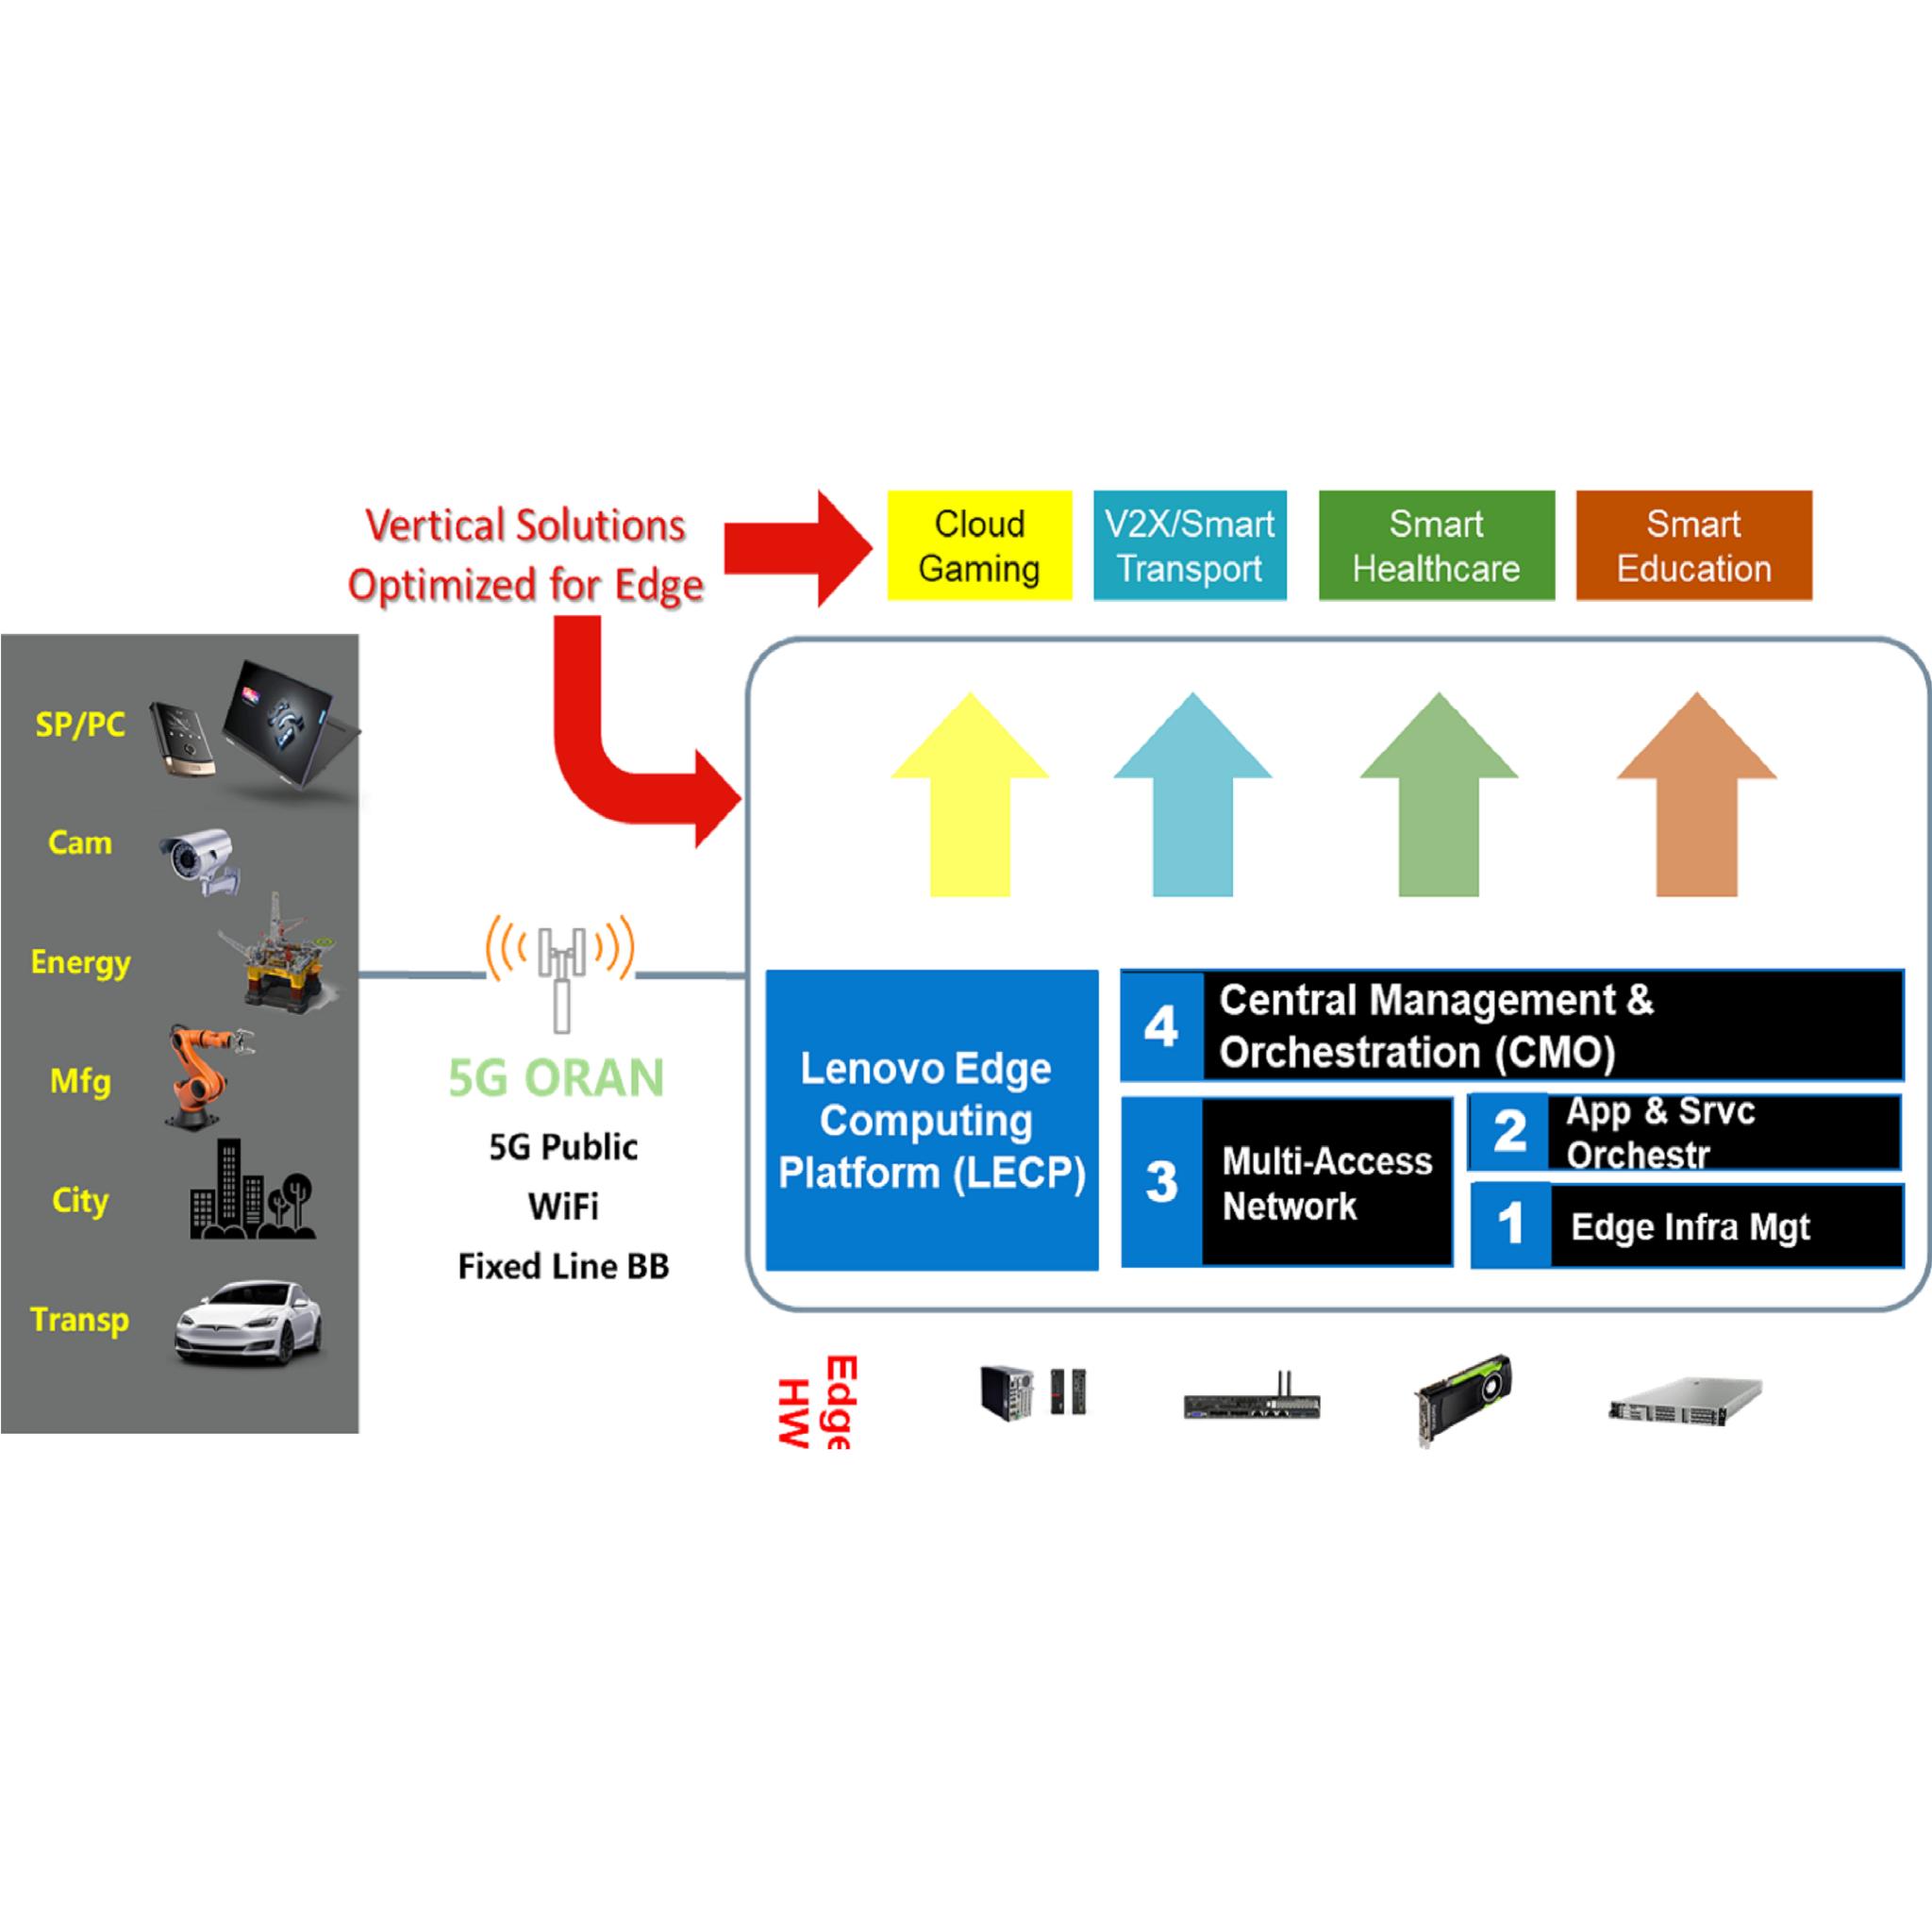 Lenovo Edge Computing Platform (LECP)